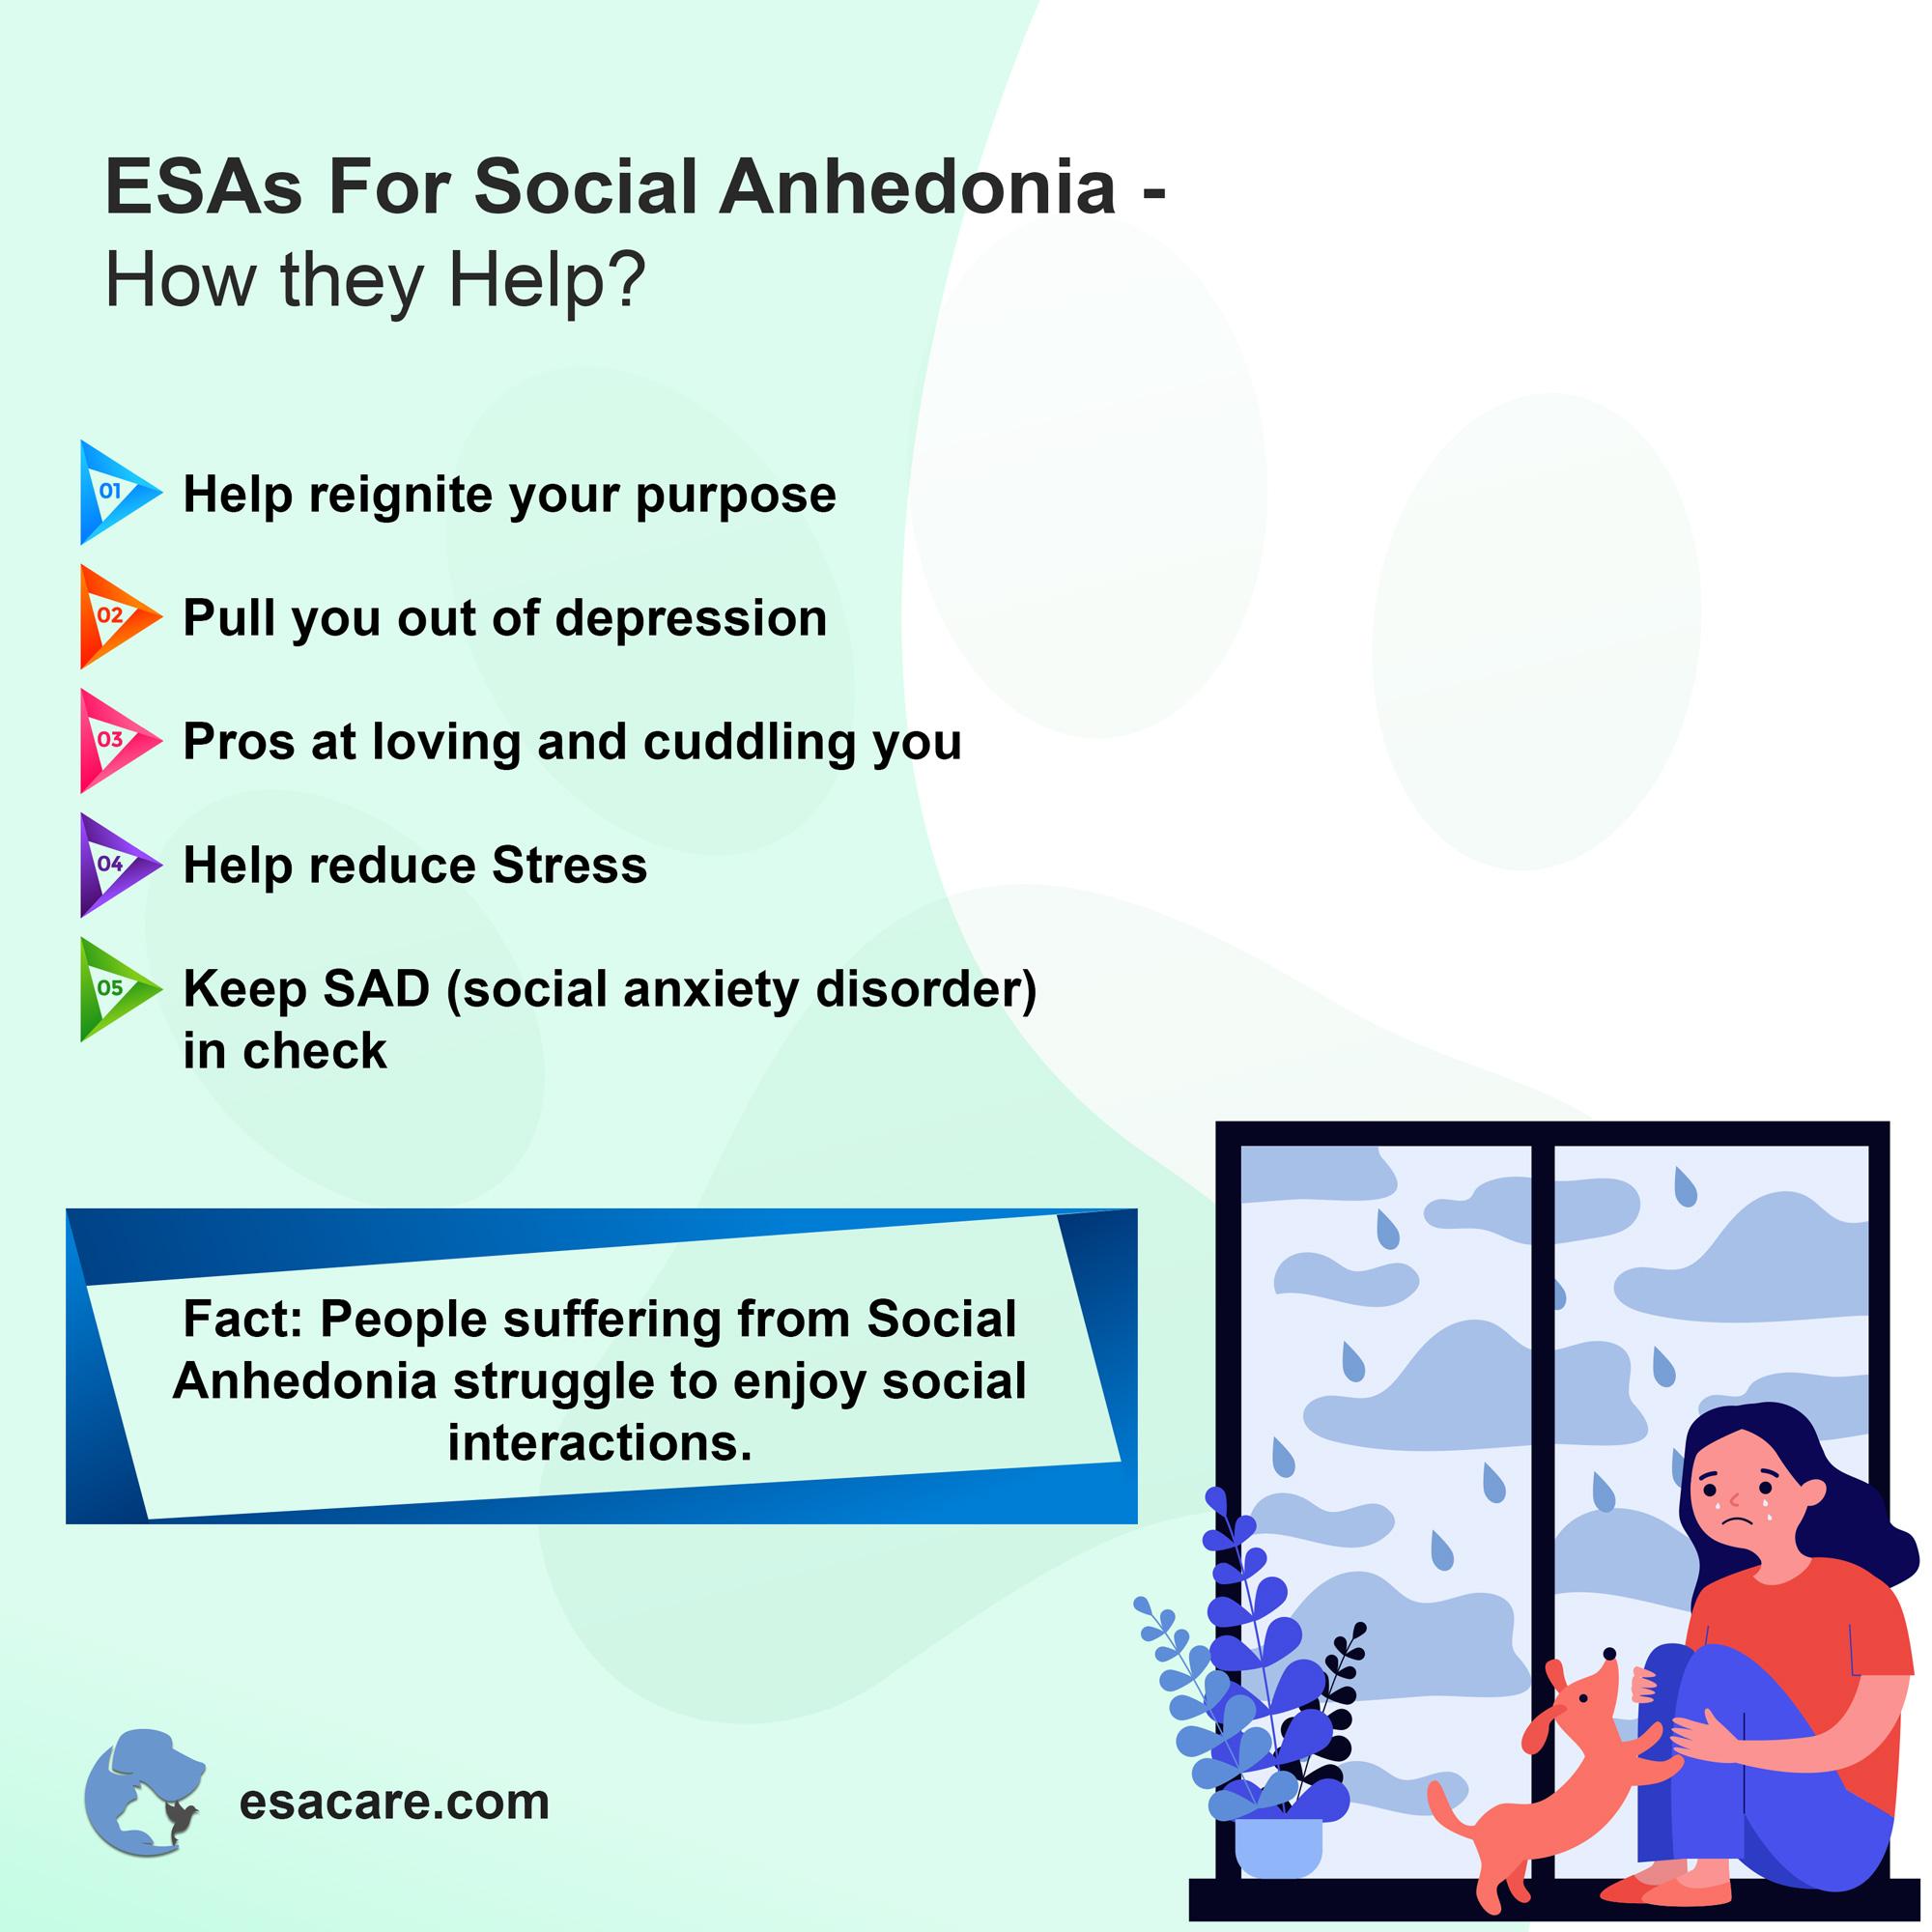 ESAs social anhedonia